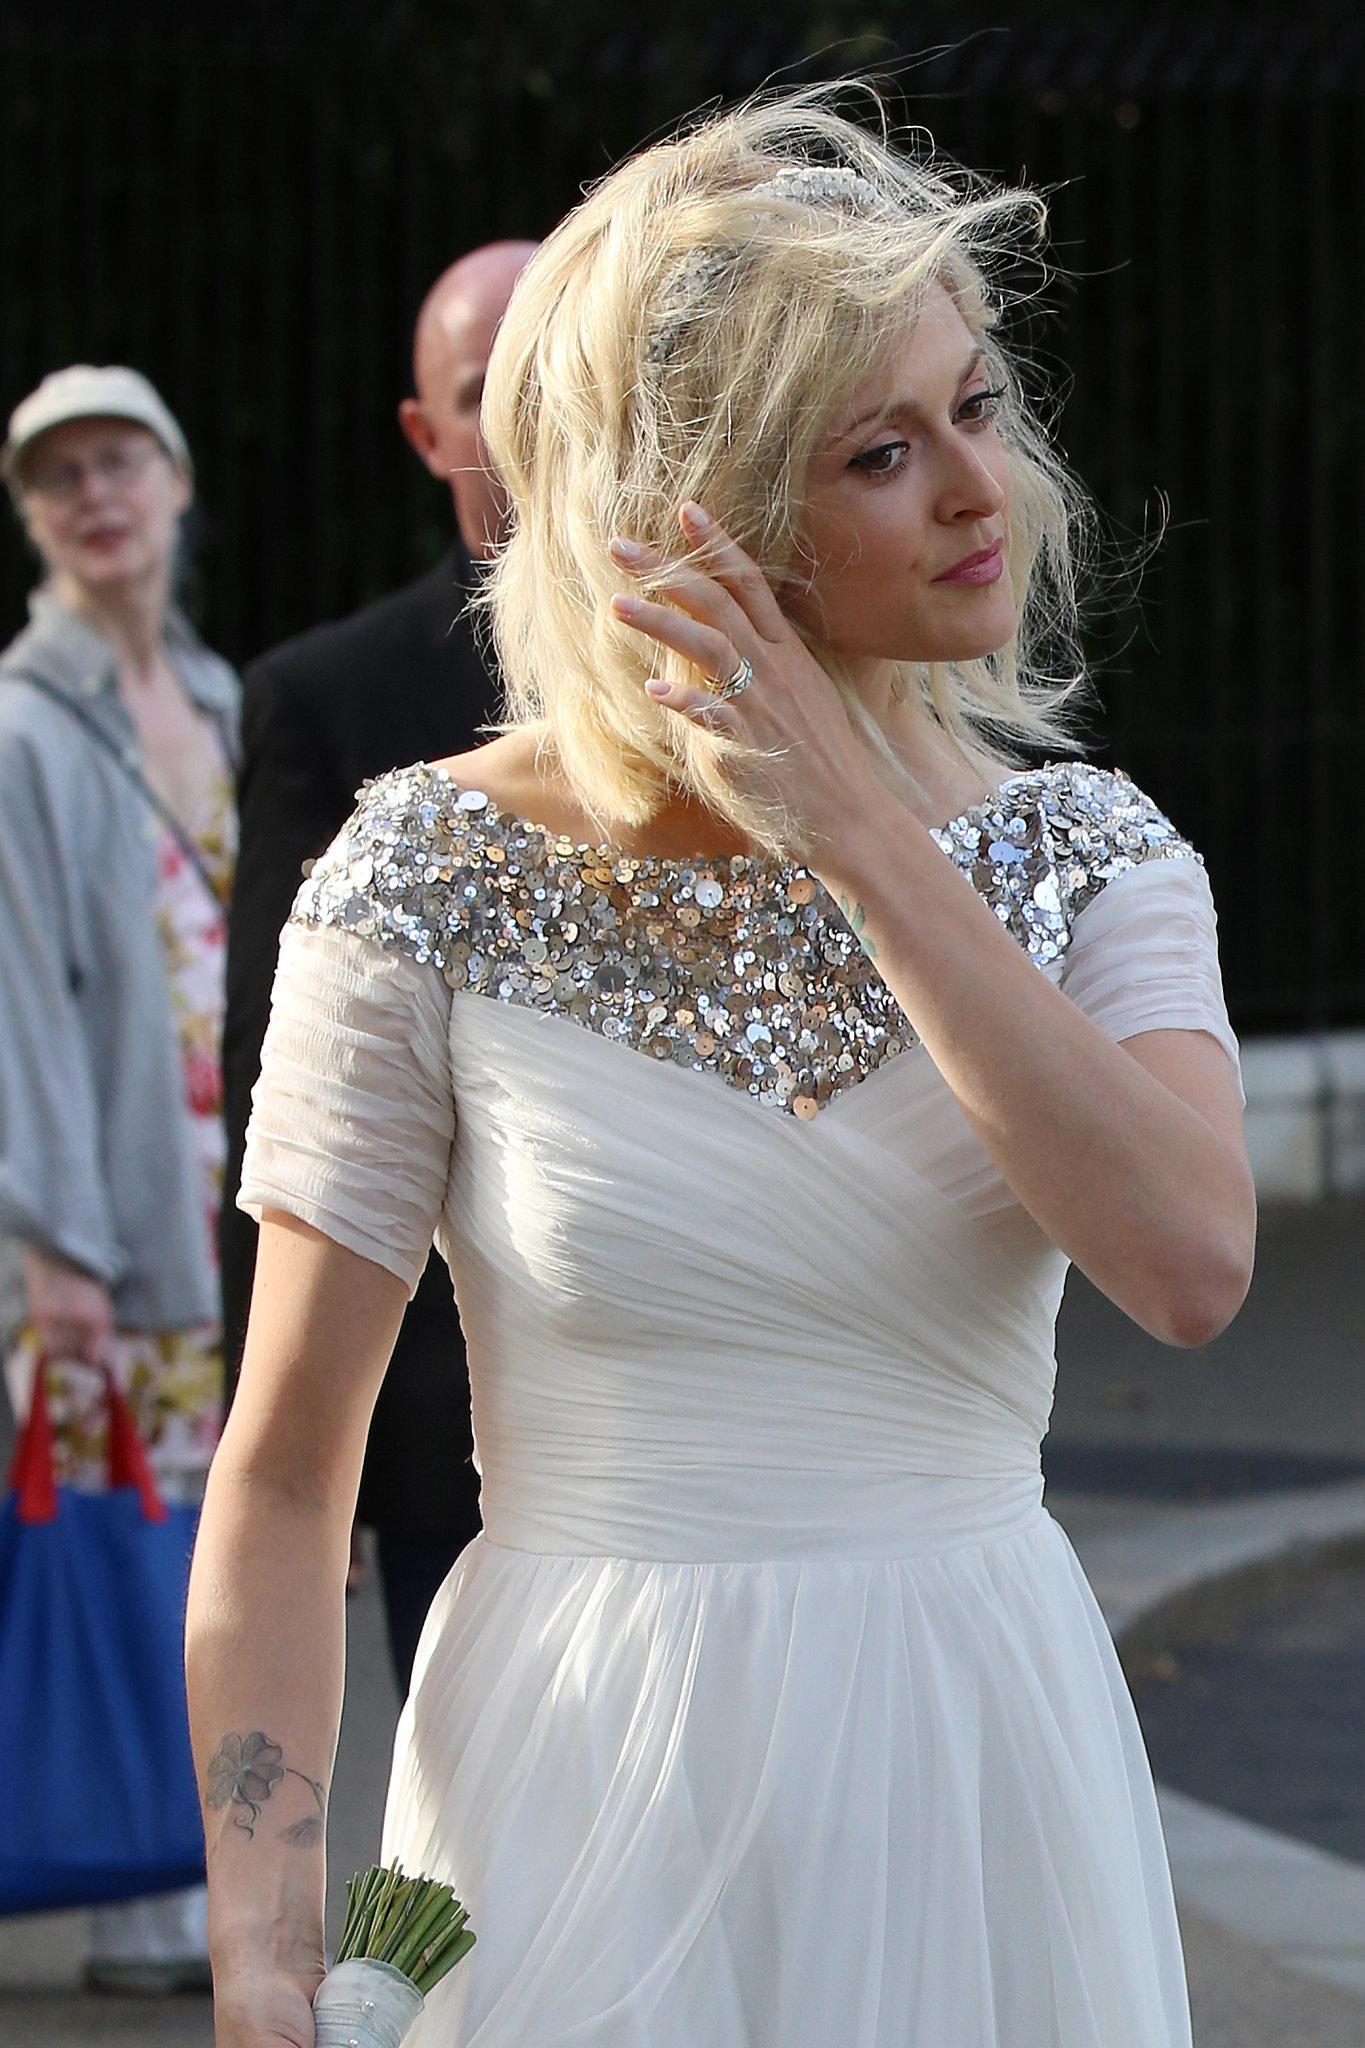 Fearne Cotton wears a sparkling wedding dress to marry Jesse Wood